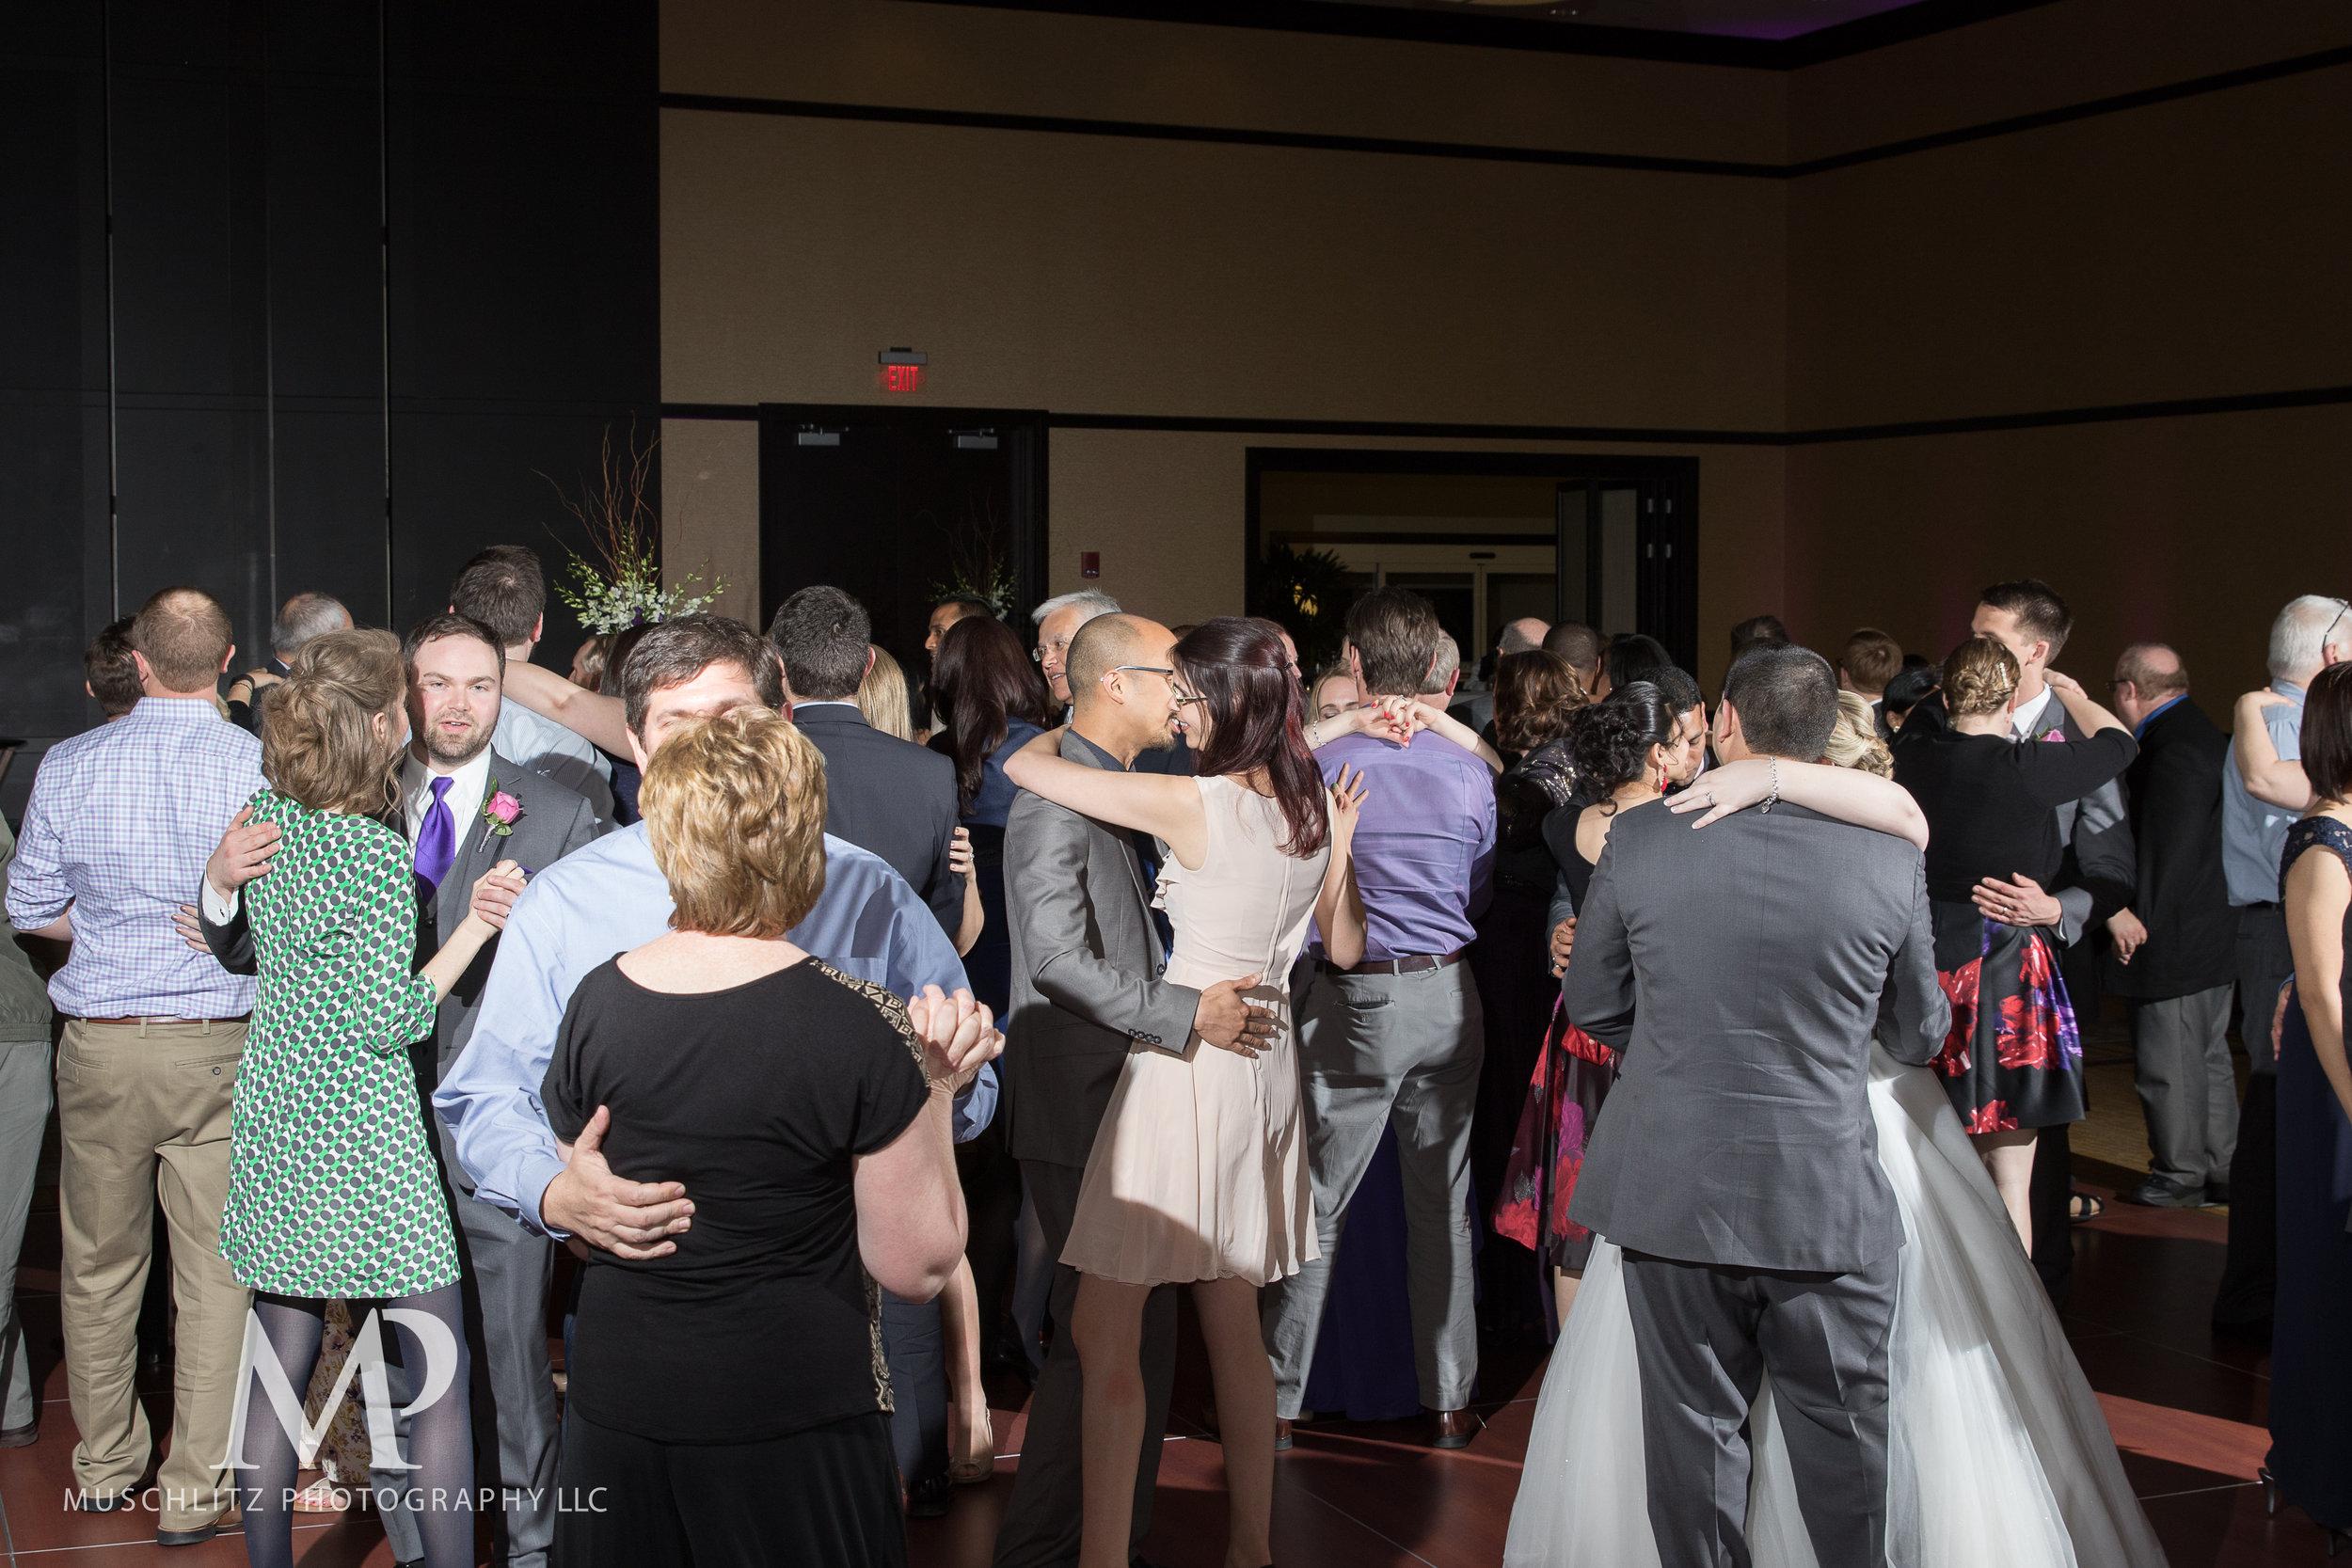 hilton-polaris-wedding-columbus-ohio-muschlitz-photography-056.JPG